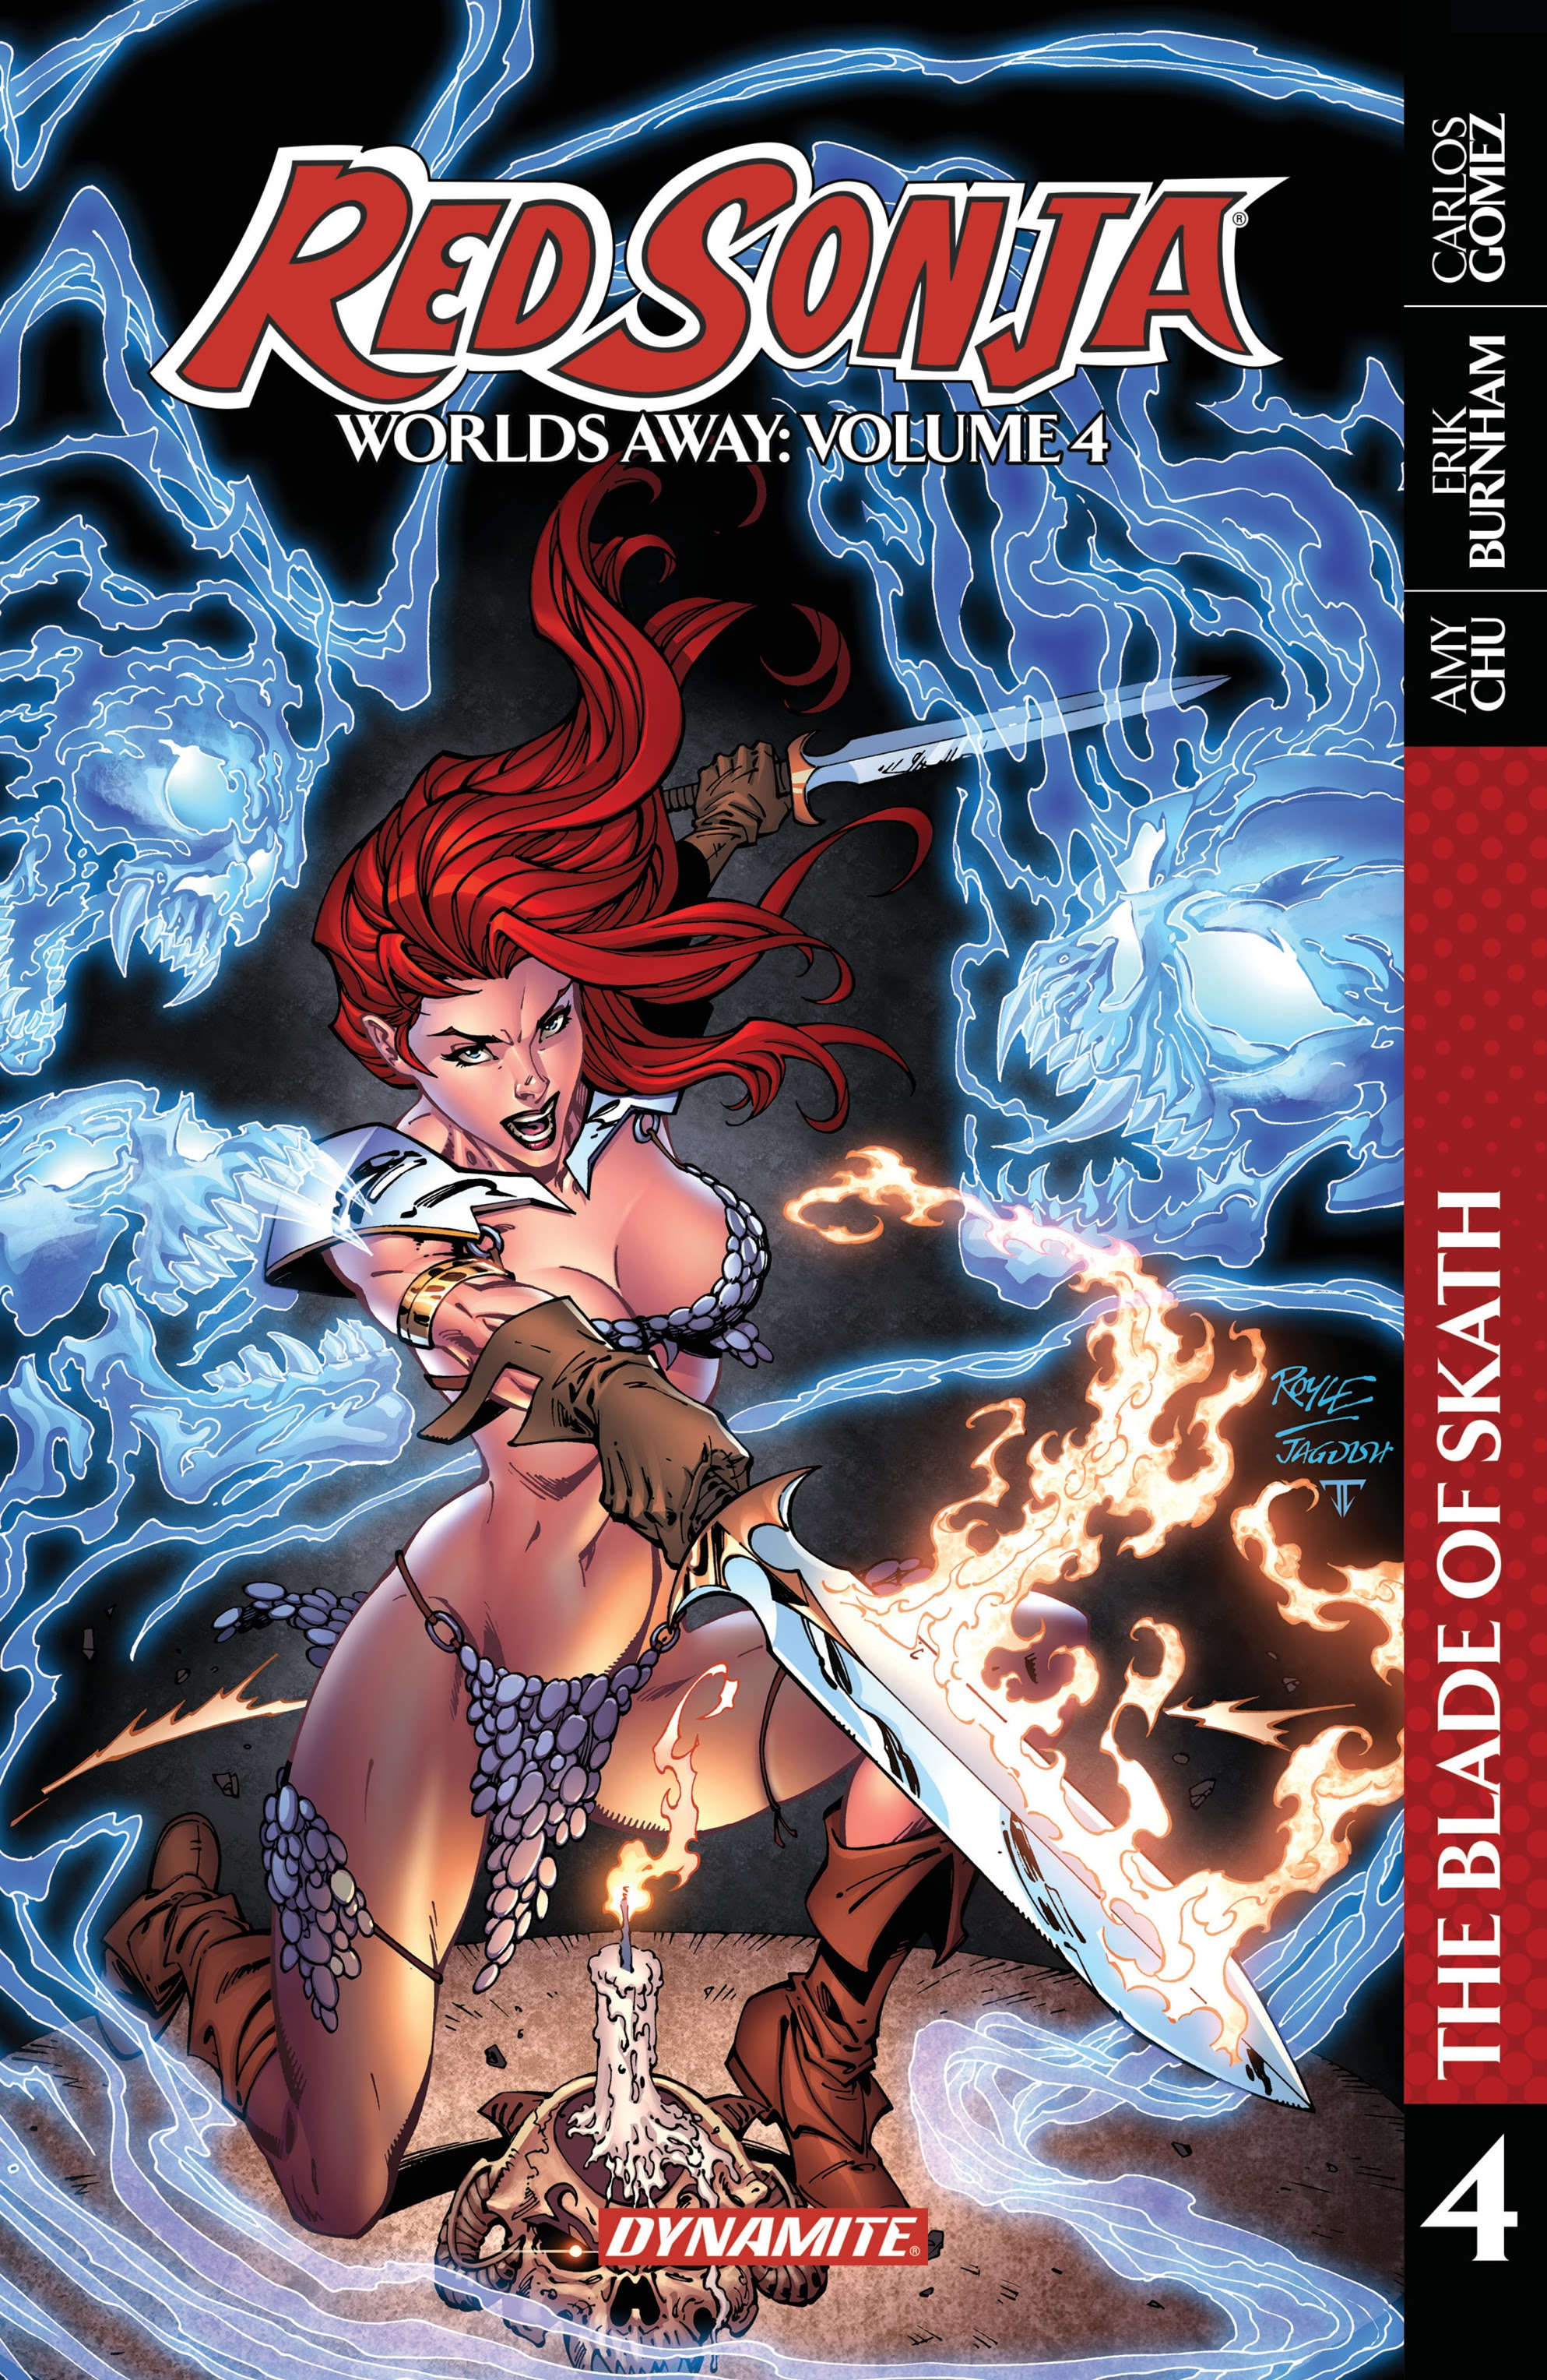 Red Sonja Vol. 4 _TPB_4 Page 1